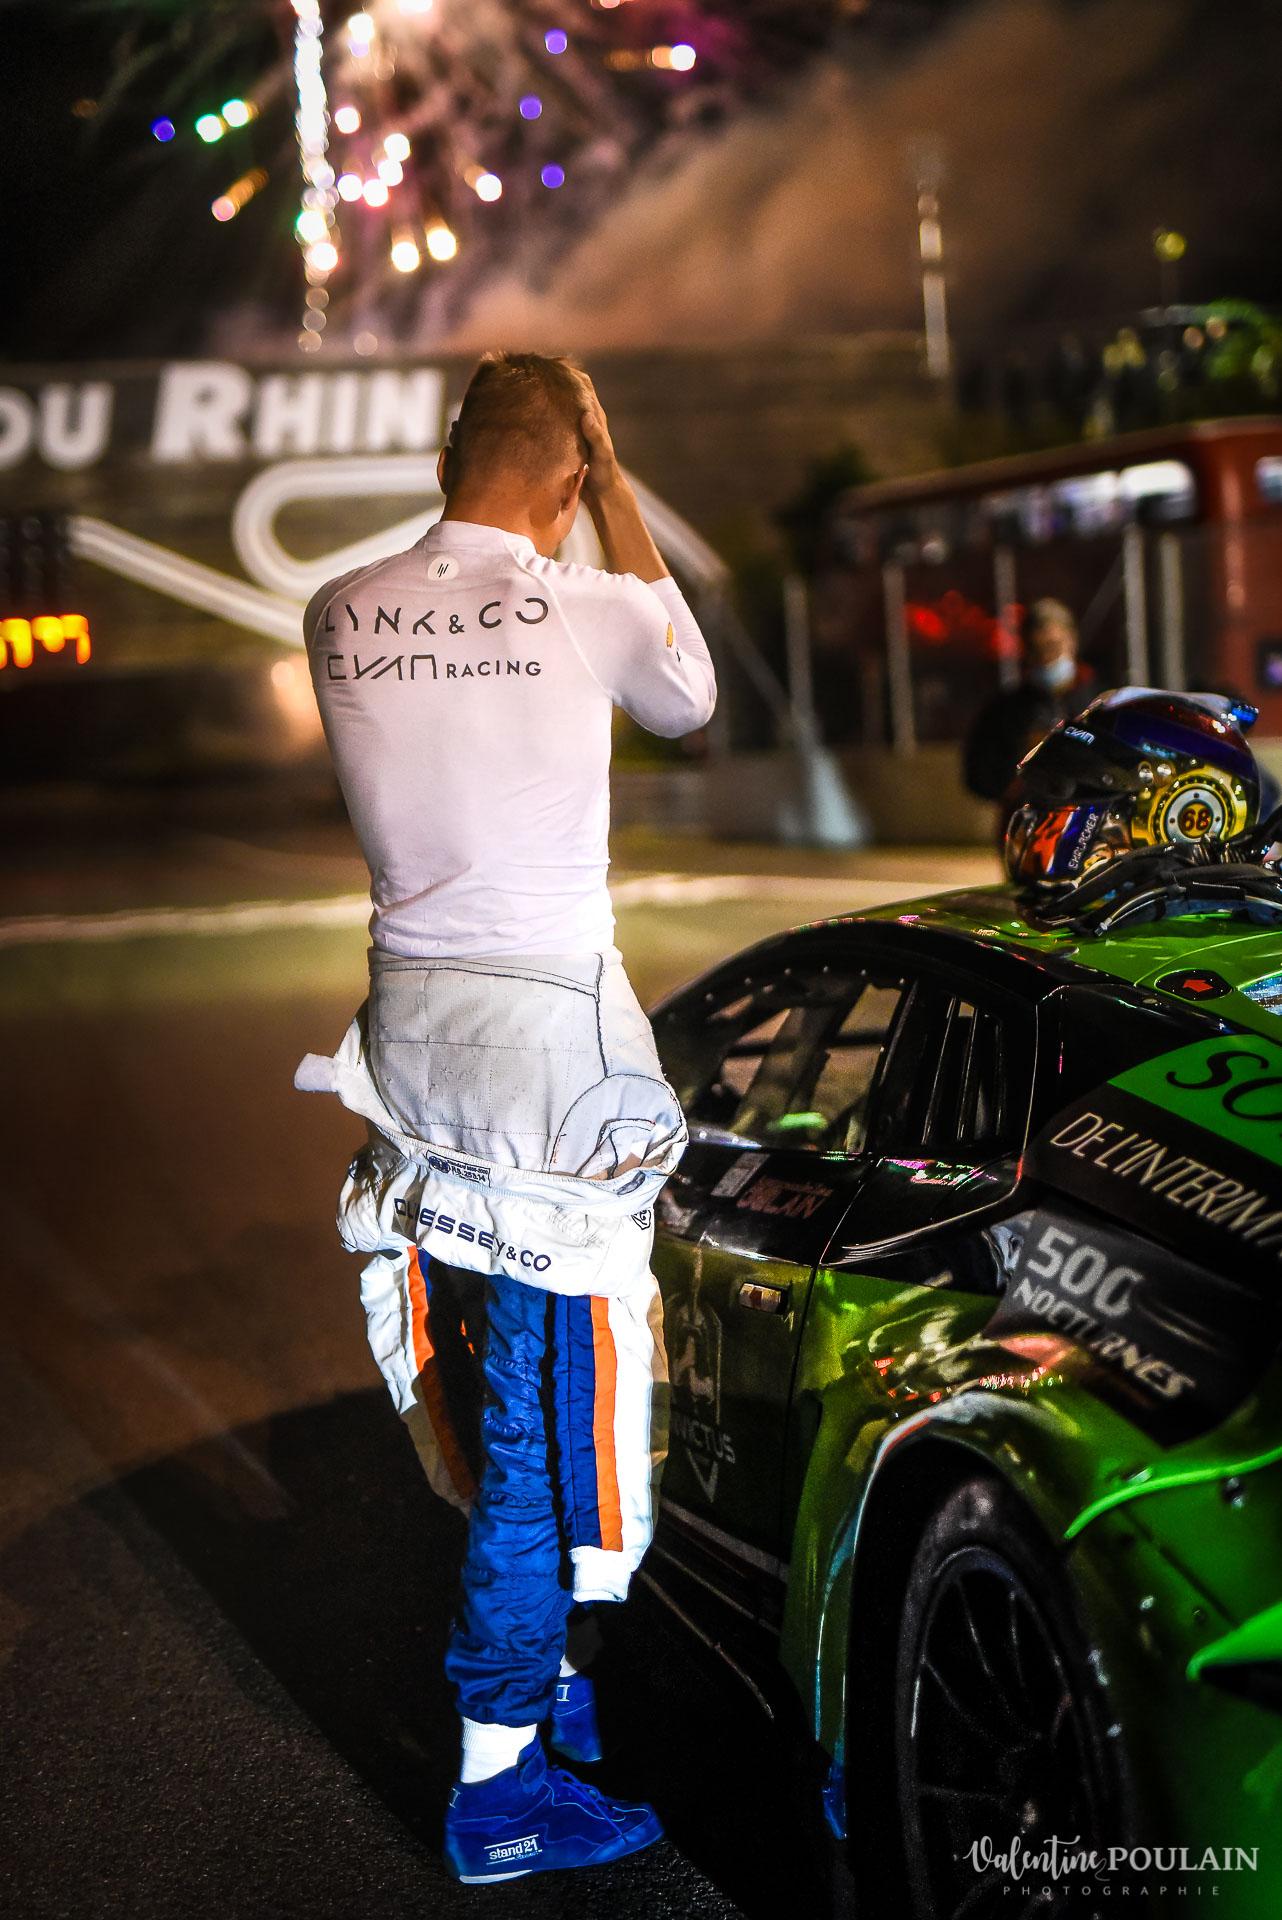 Victoire Portrait de pilote Evenement sportif Bugatti Chiron pur sport -automobile_Valentine Poulain -